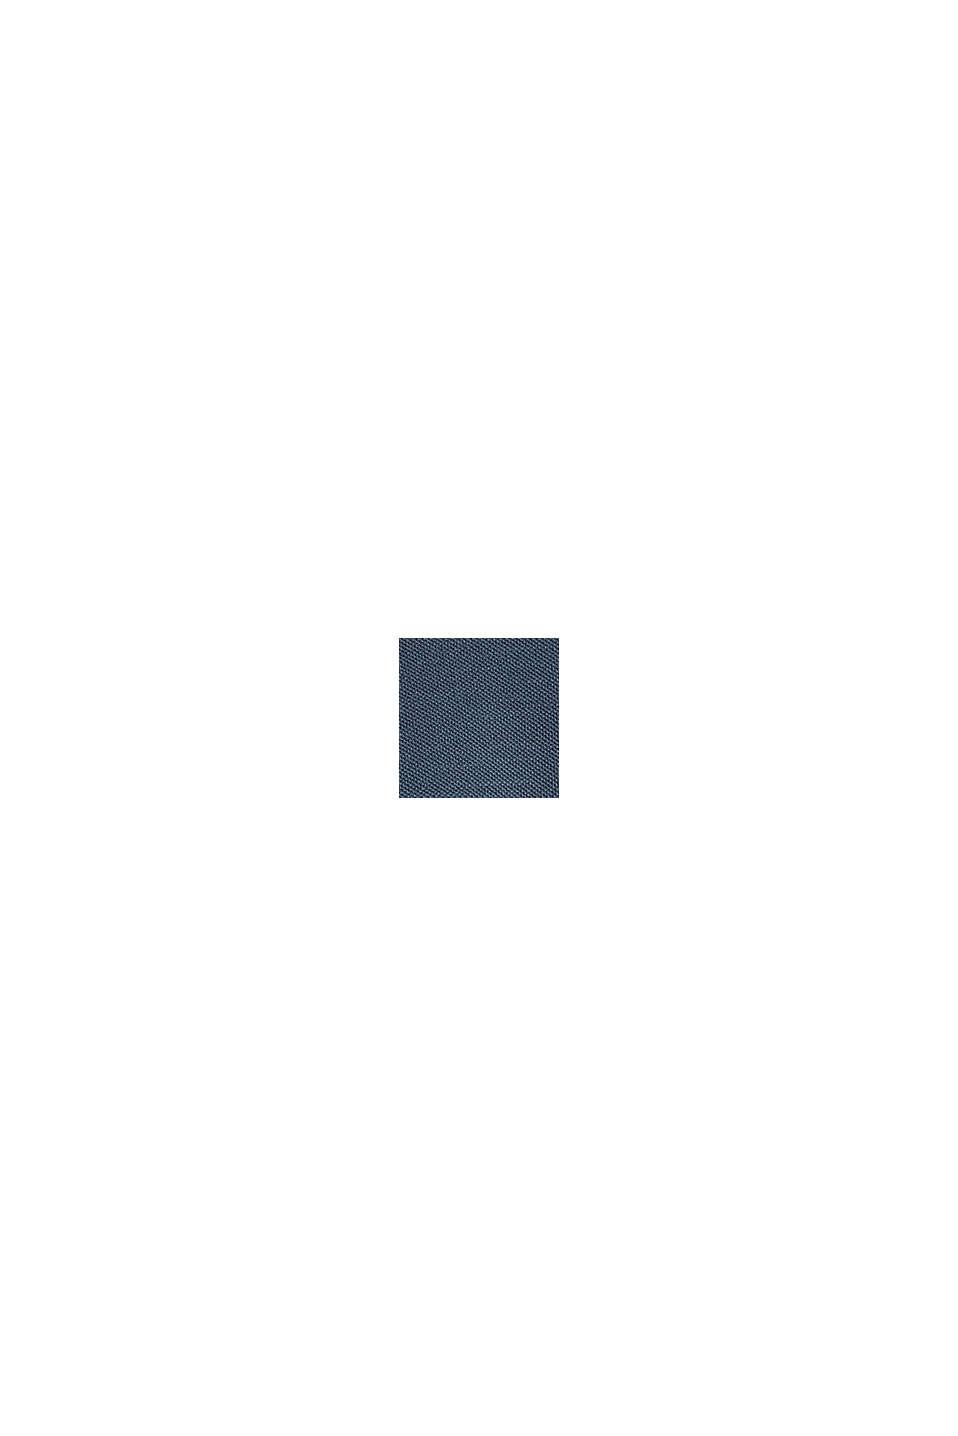 EarthColors® : t-shirt en maille piquée, NAVY, swatch